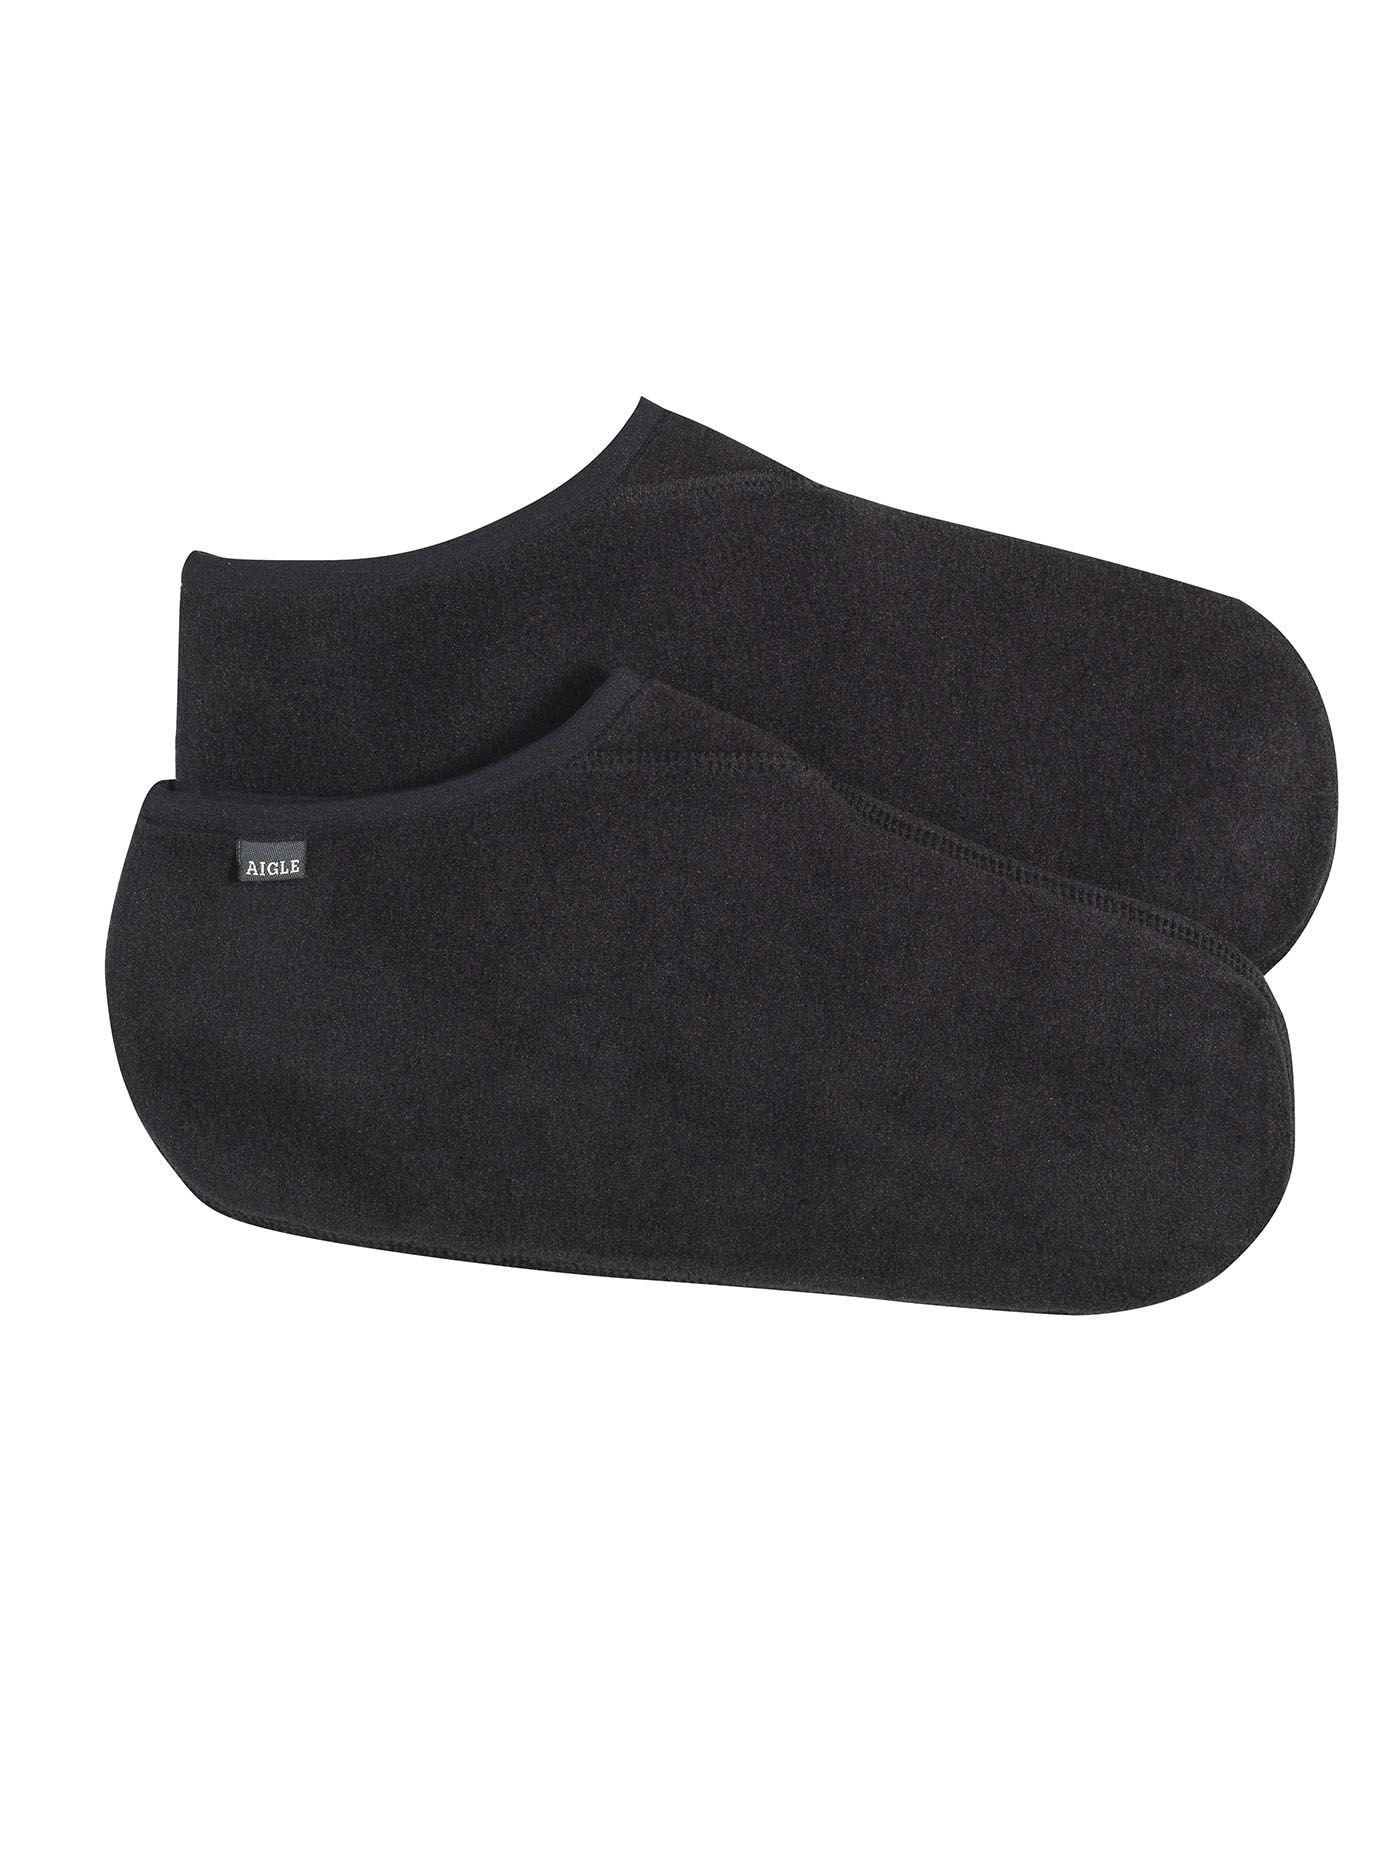 L For Men Shoes Aigle Accessories wOnvmN80